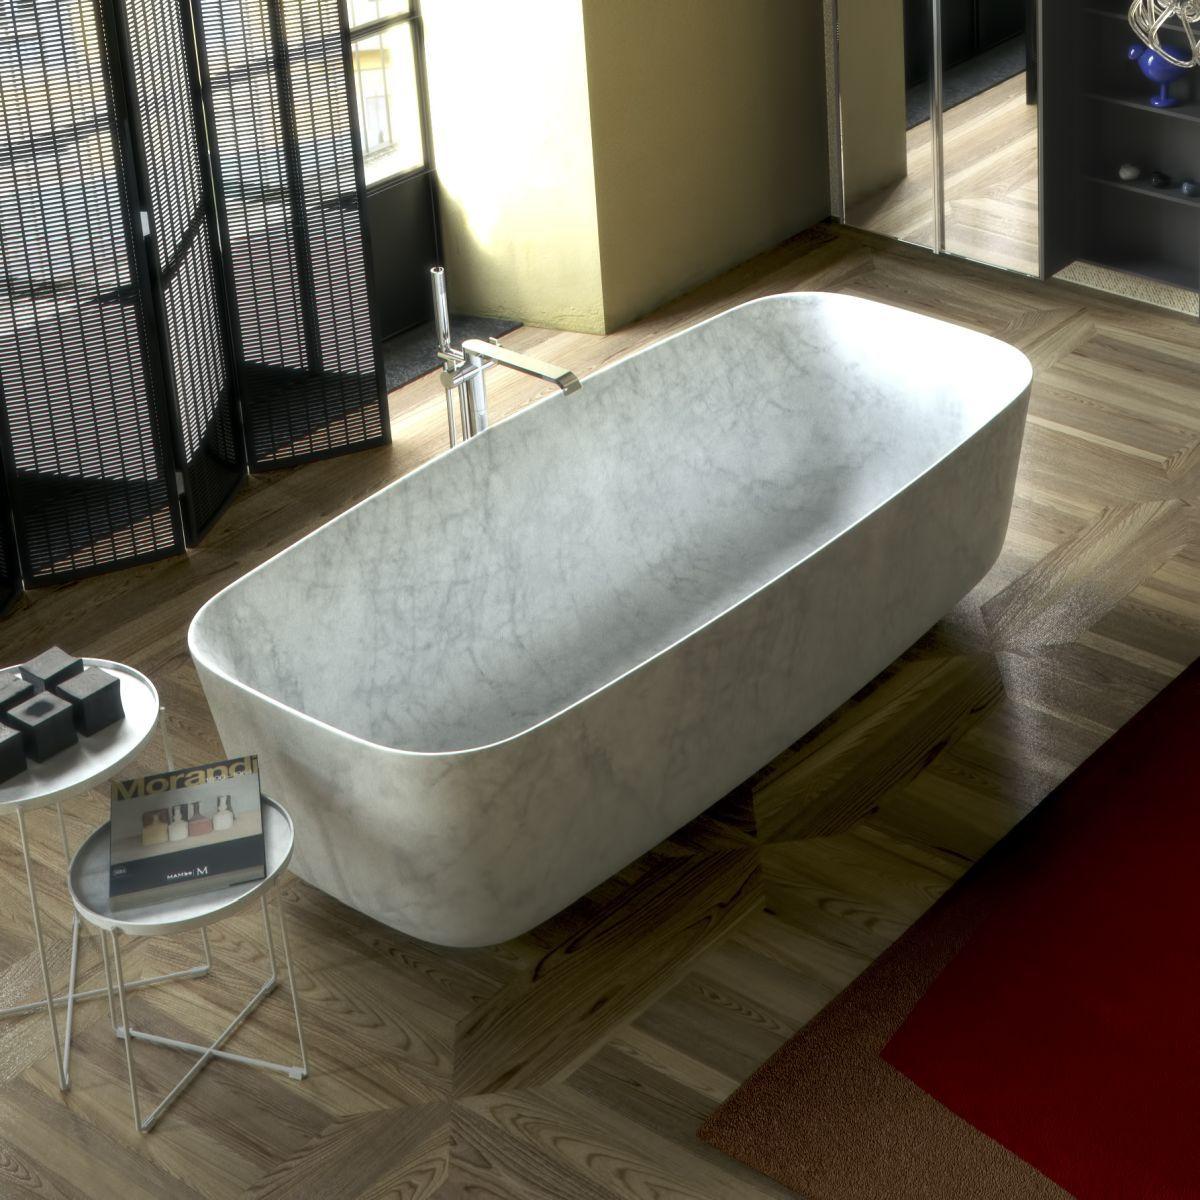 The Latest Designs That Turn Bathtubs Into Works Of Art Free Standing Bath Tub Bathtub Design Free Standing Bath